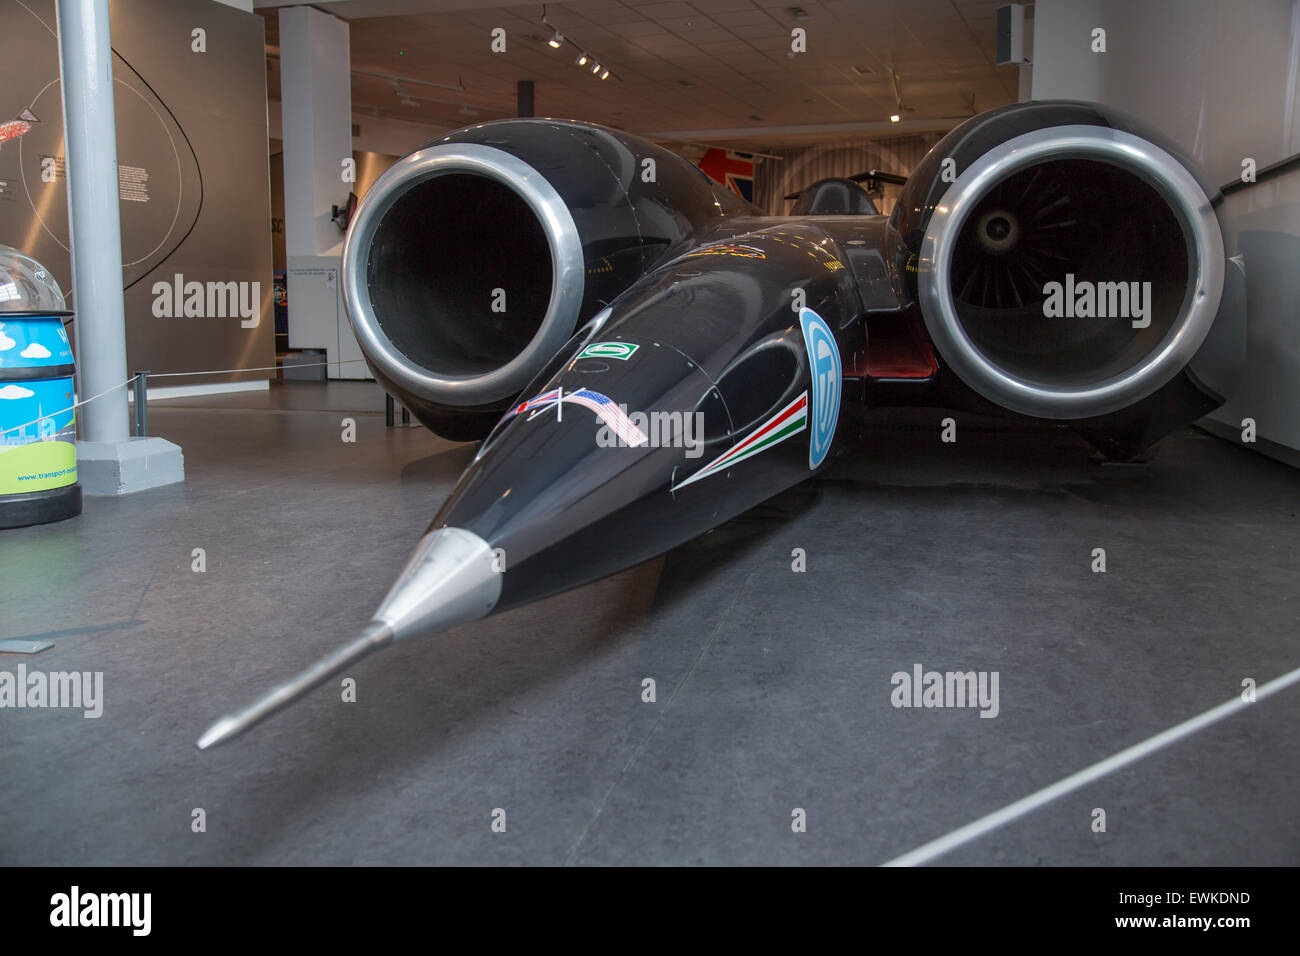 Thrust SSC Supersonic car - Stock Image